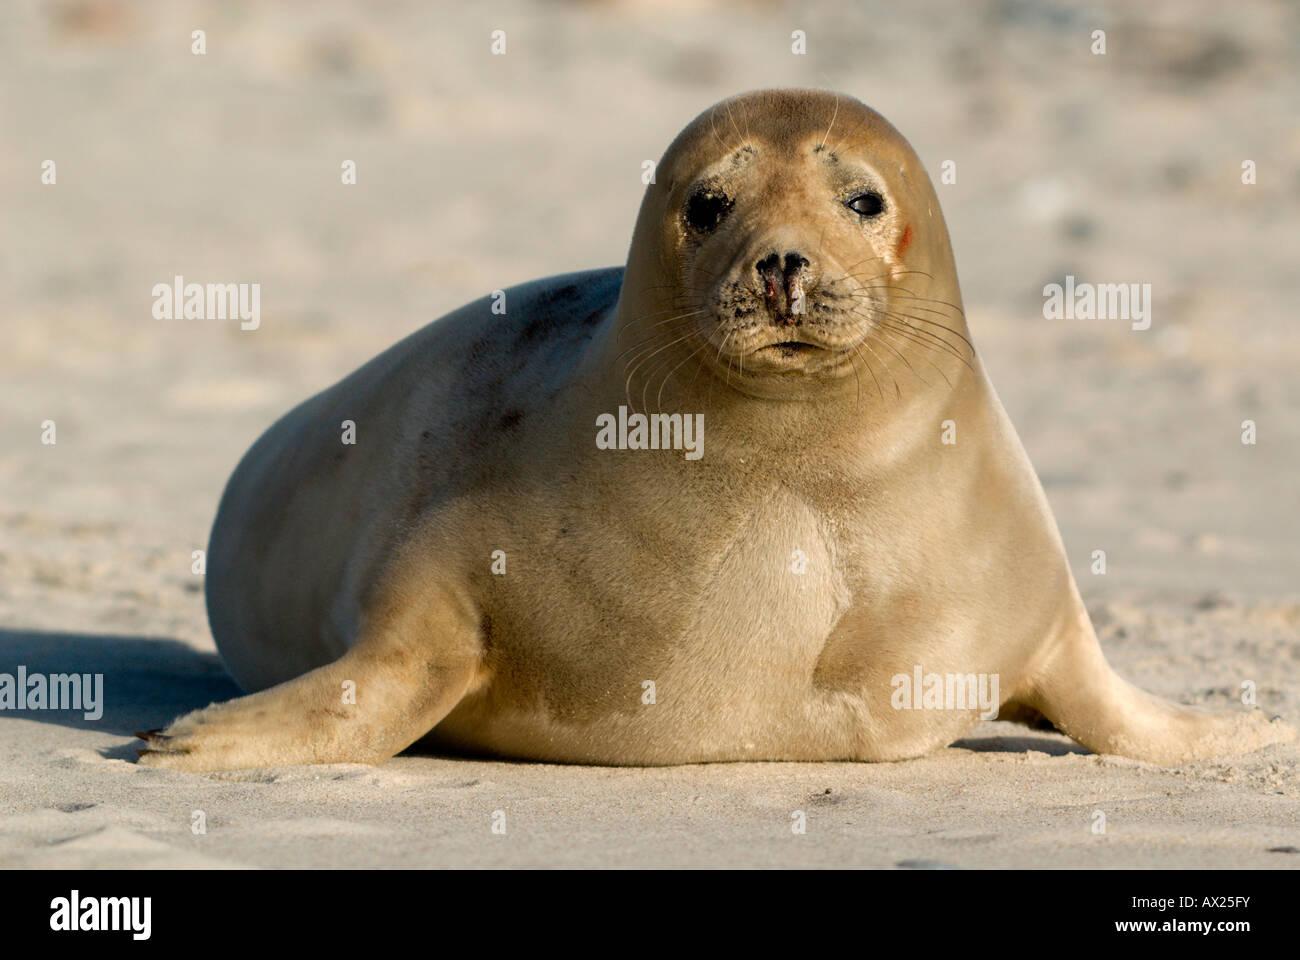 Young Atlantic Grey Seal (Halichoerus grypus), Helgoland Island, North Sea, Lower Saxony, Germany, Europe Stock Photo